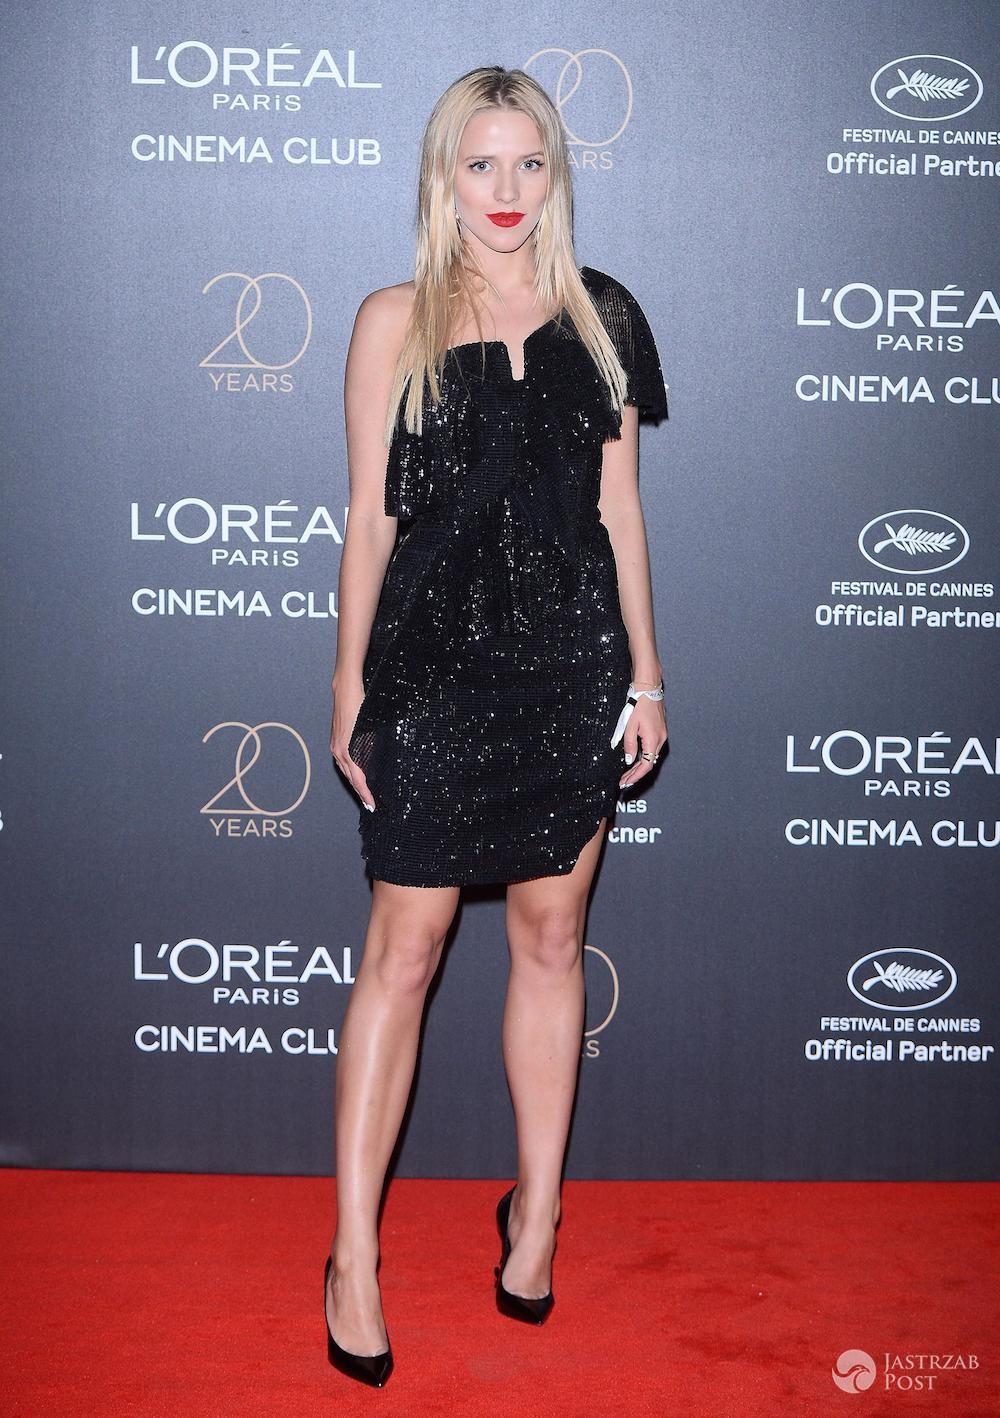 Jessica Mercedes - impreza z okazji 20-lecia marki L'Oreal w Cannes 2017